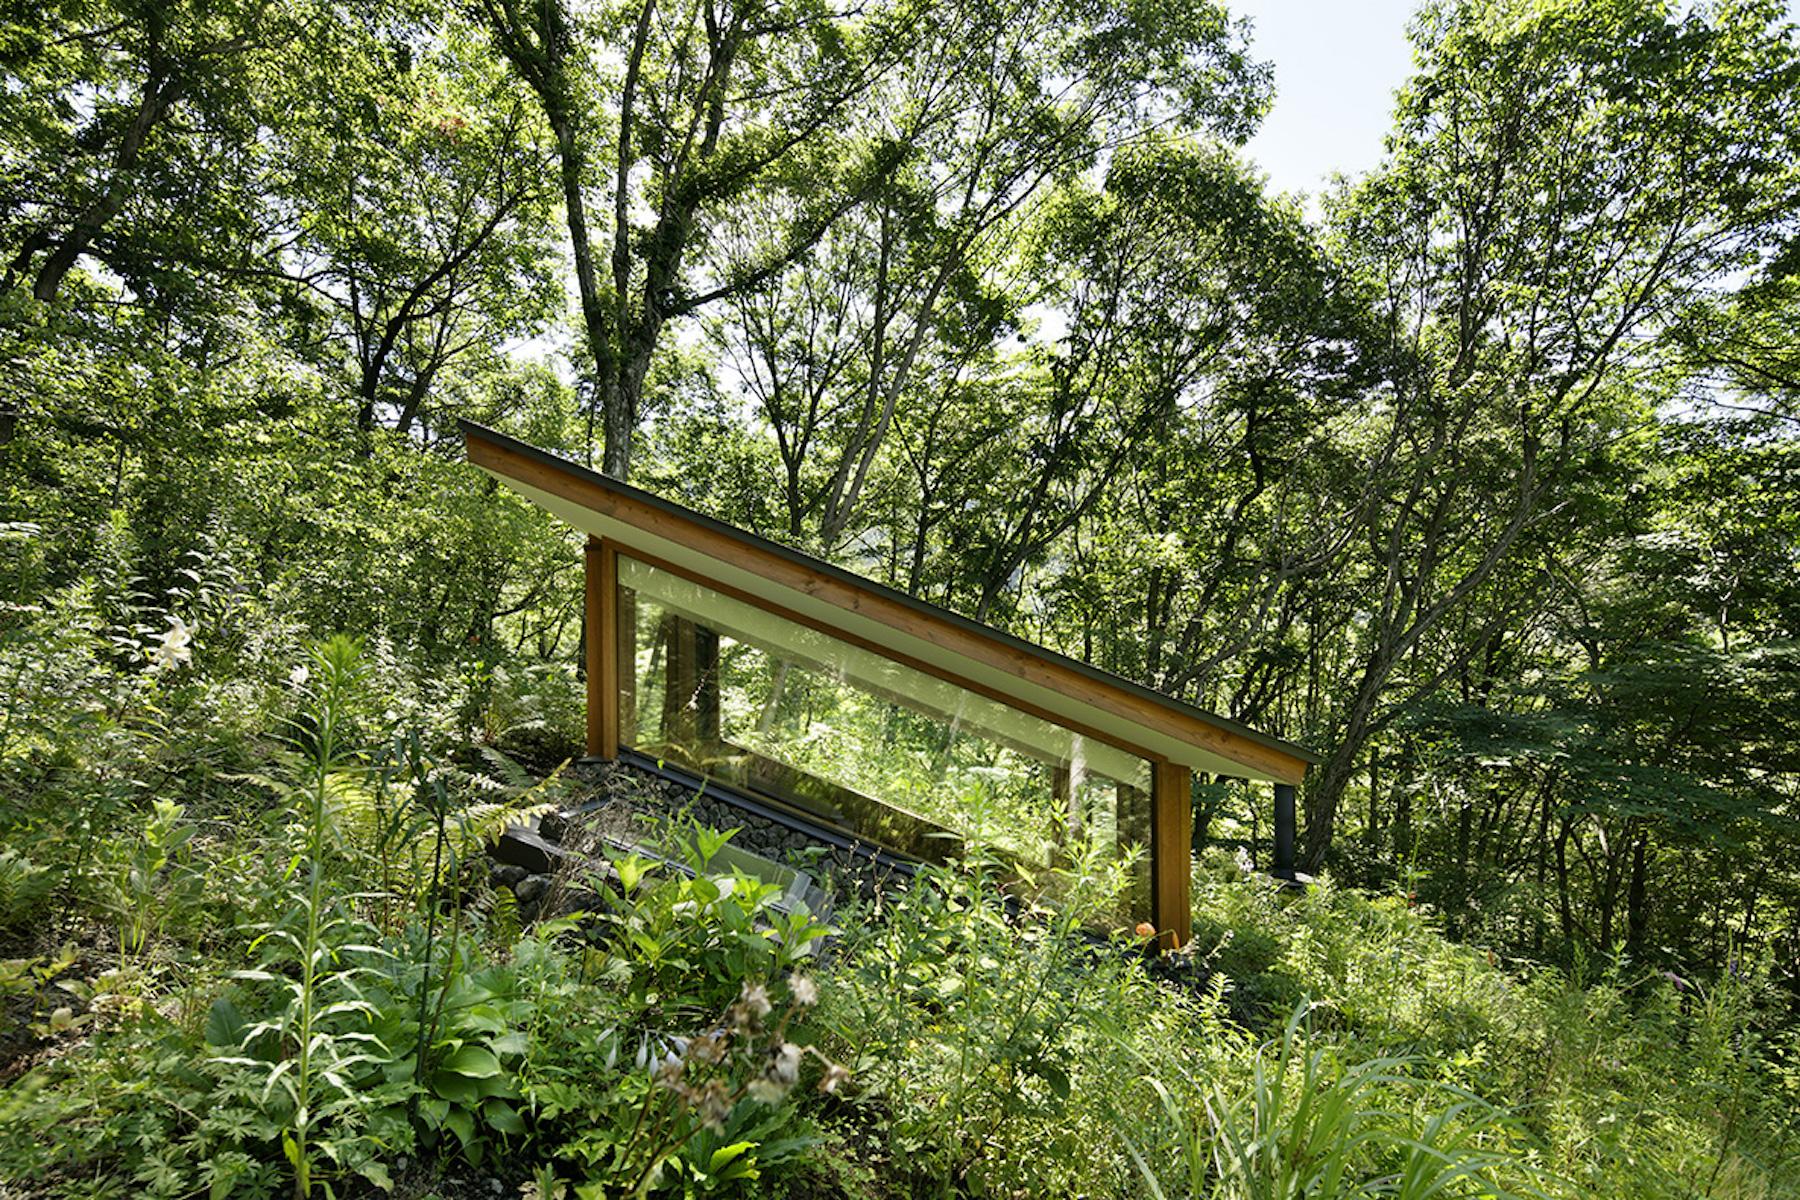 Arquitectura del paisaje por Hirosi Nakamura & NAP en Japón